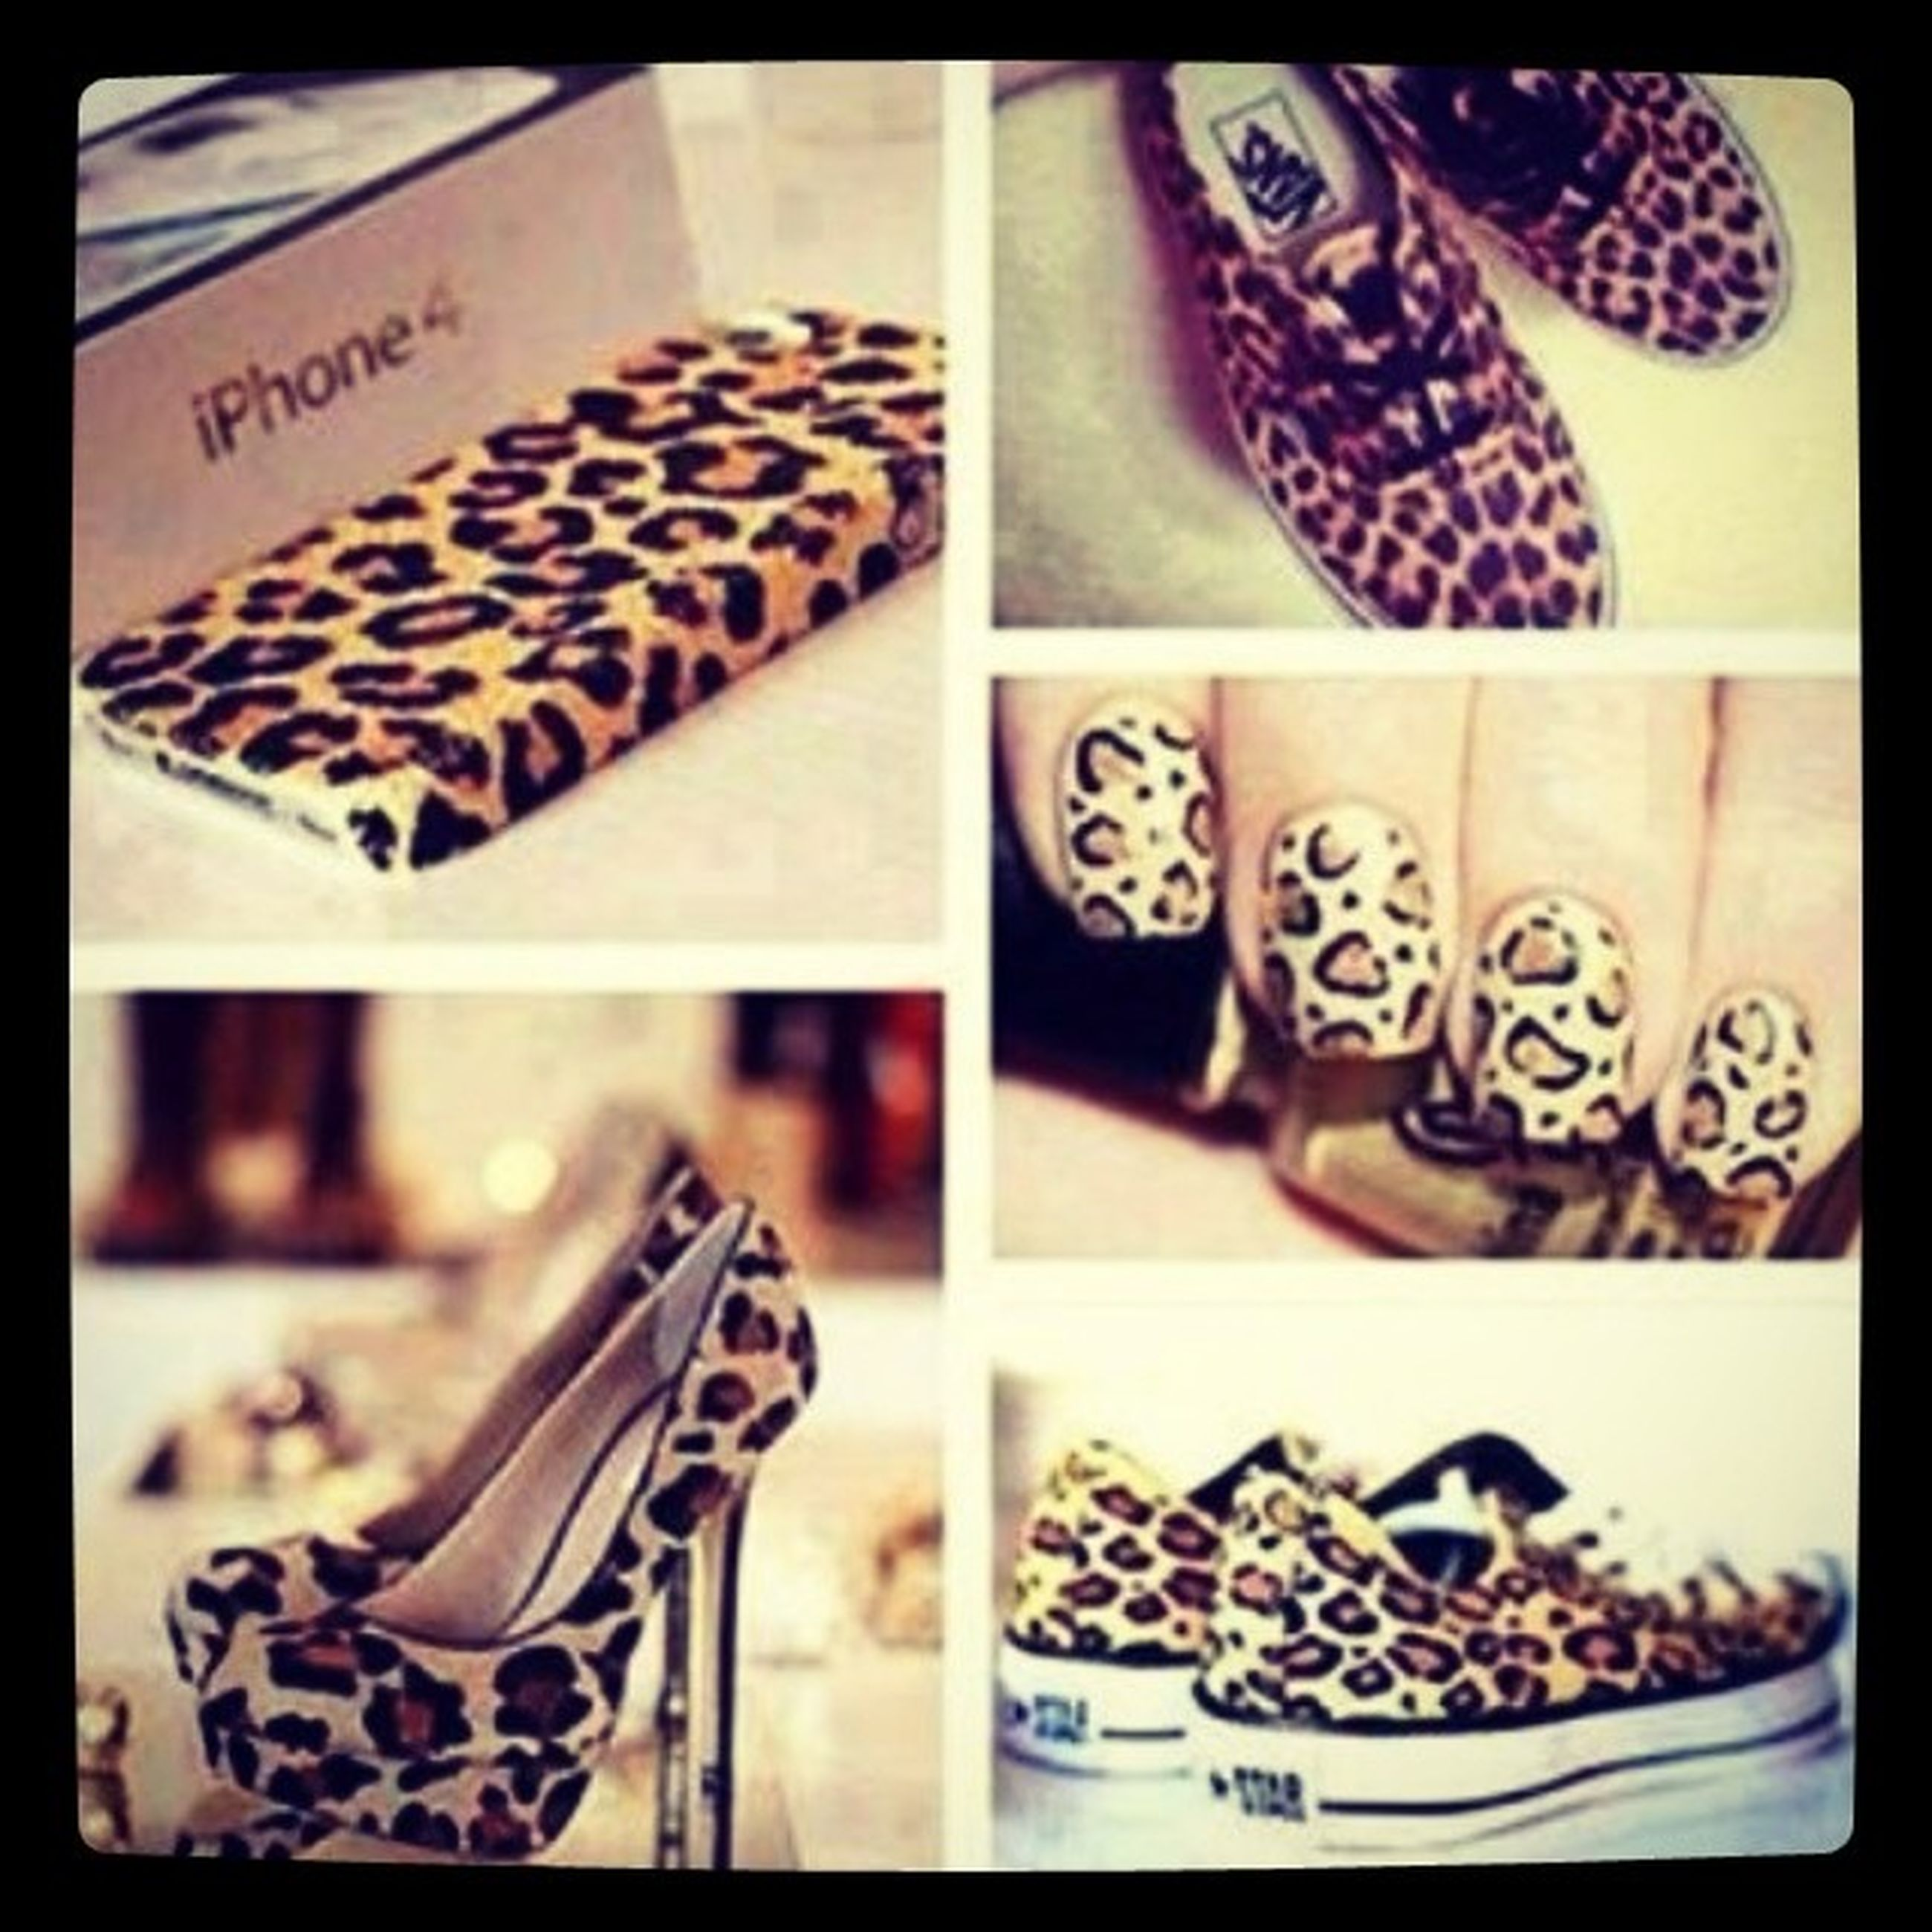 Fashionable isn't it Leopardprint  (c)stylish BejackFROST